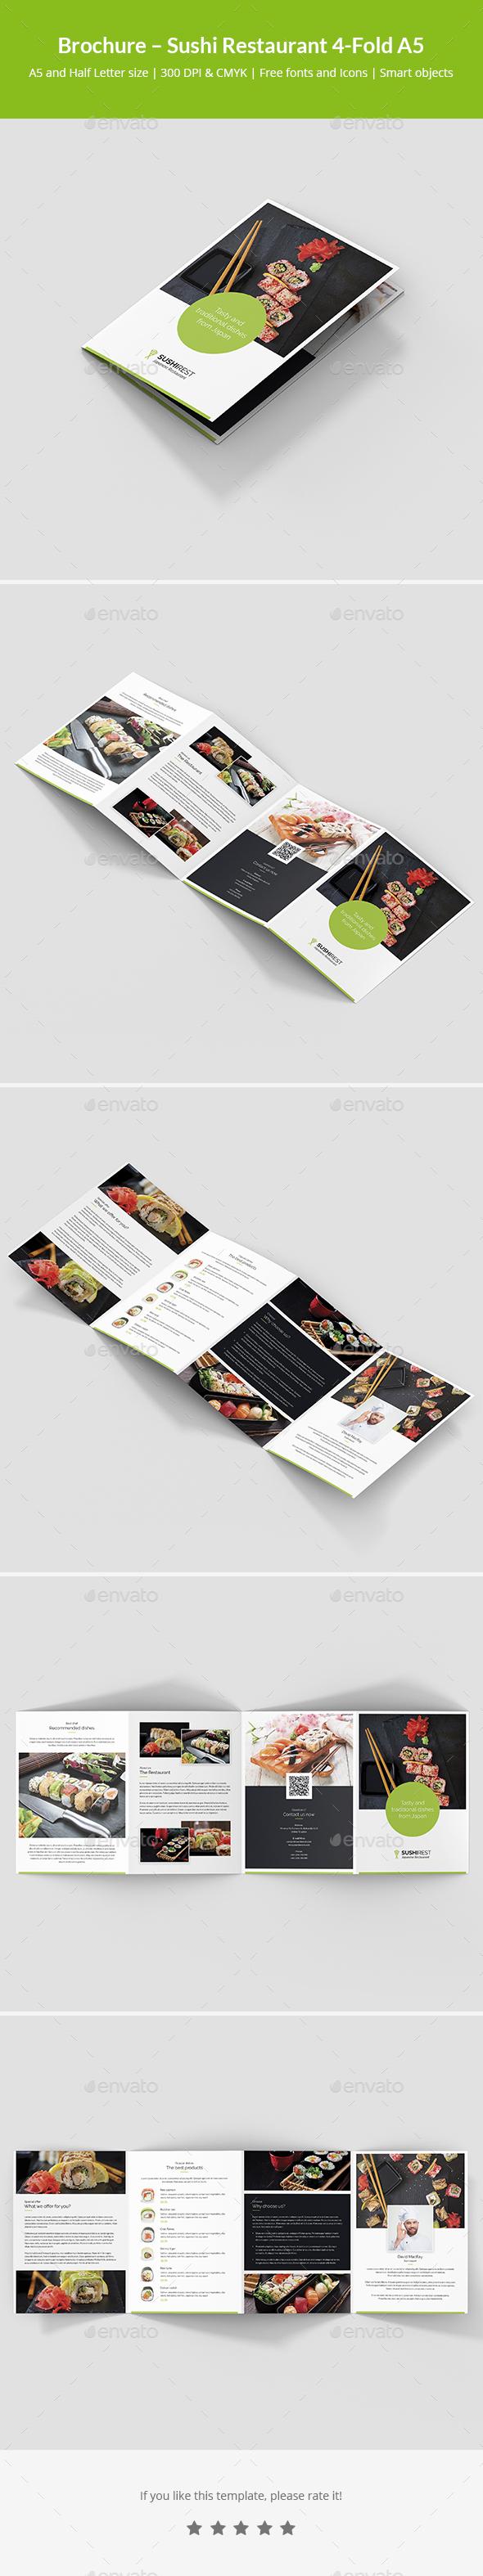 Brochure – Sushi Restaurant 4-Fold A5 - Informational Brochures